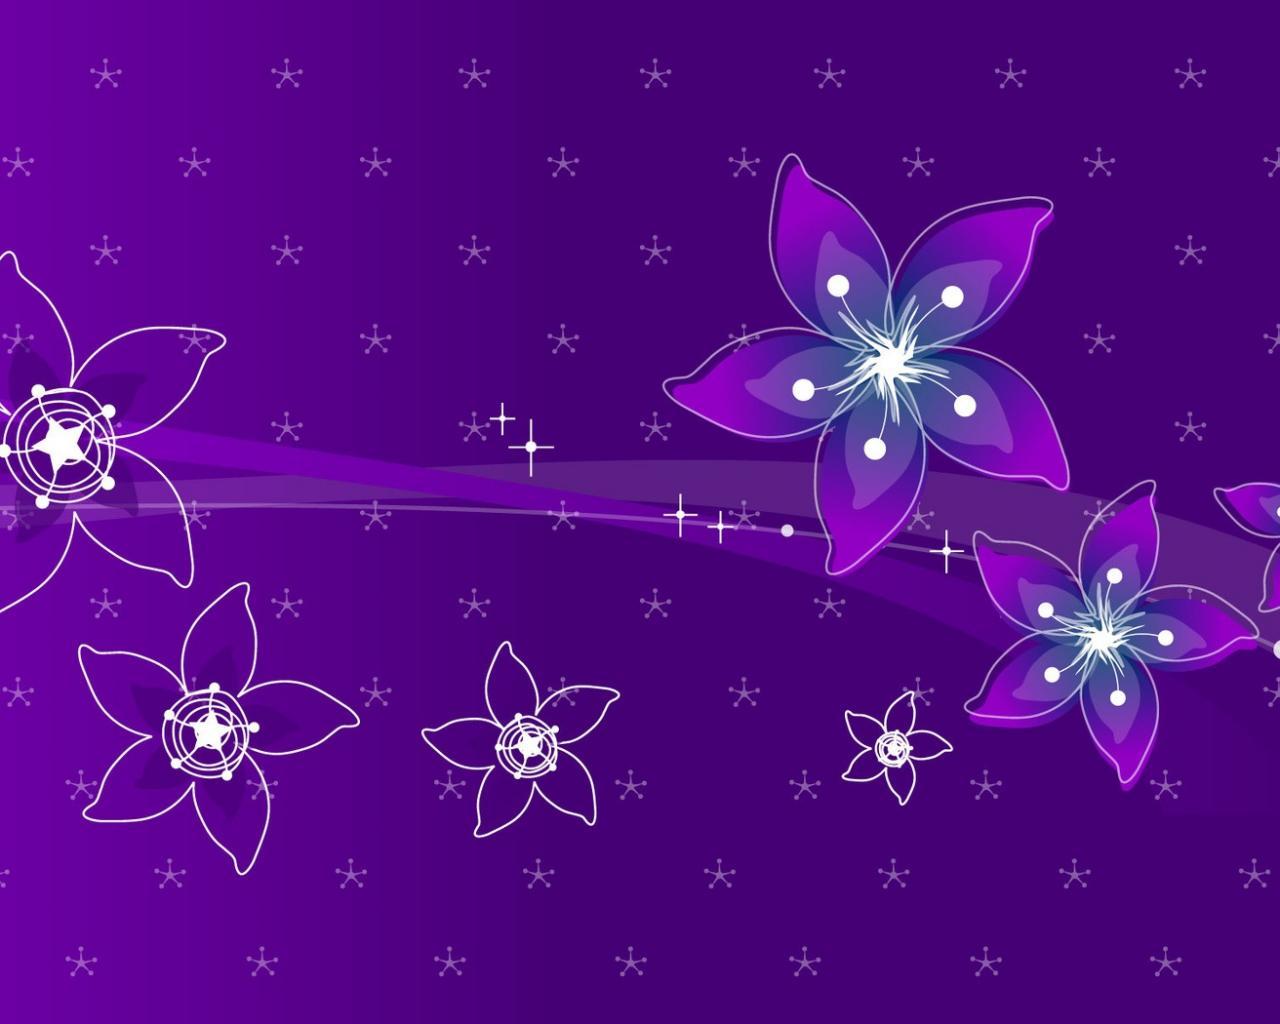 ... Design Purple Background wallpapers hd 1280x1024 hd desktop wallpaper